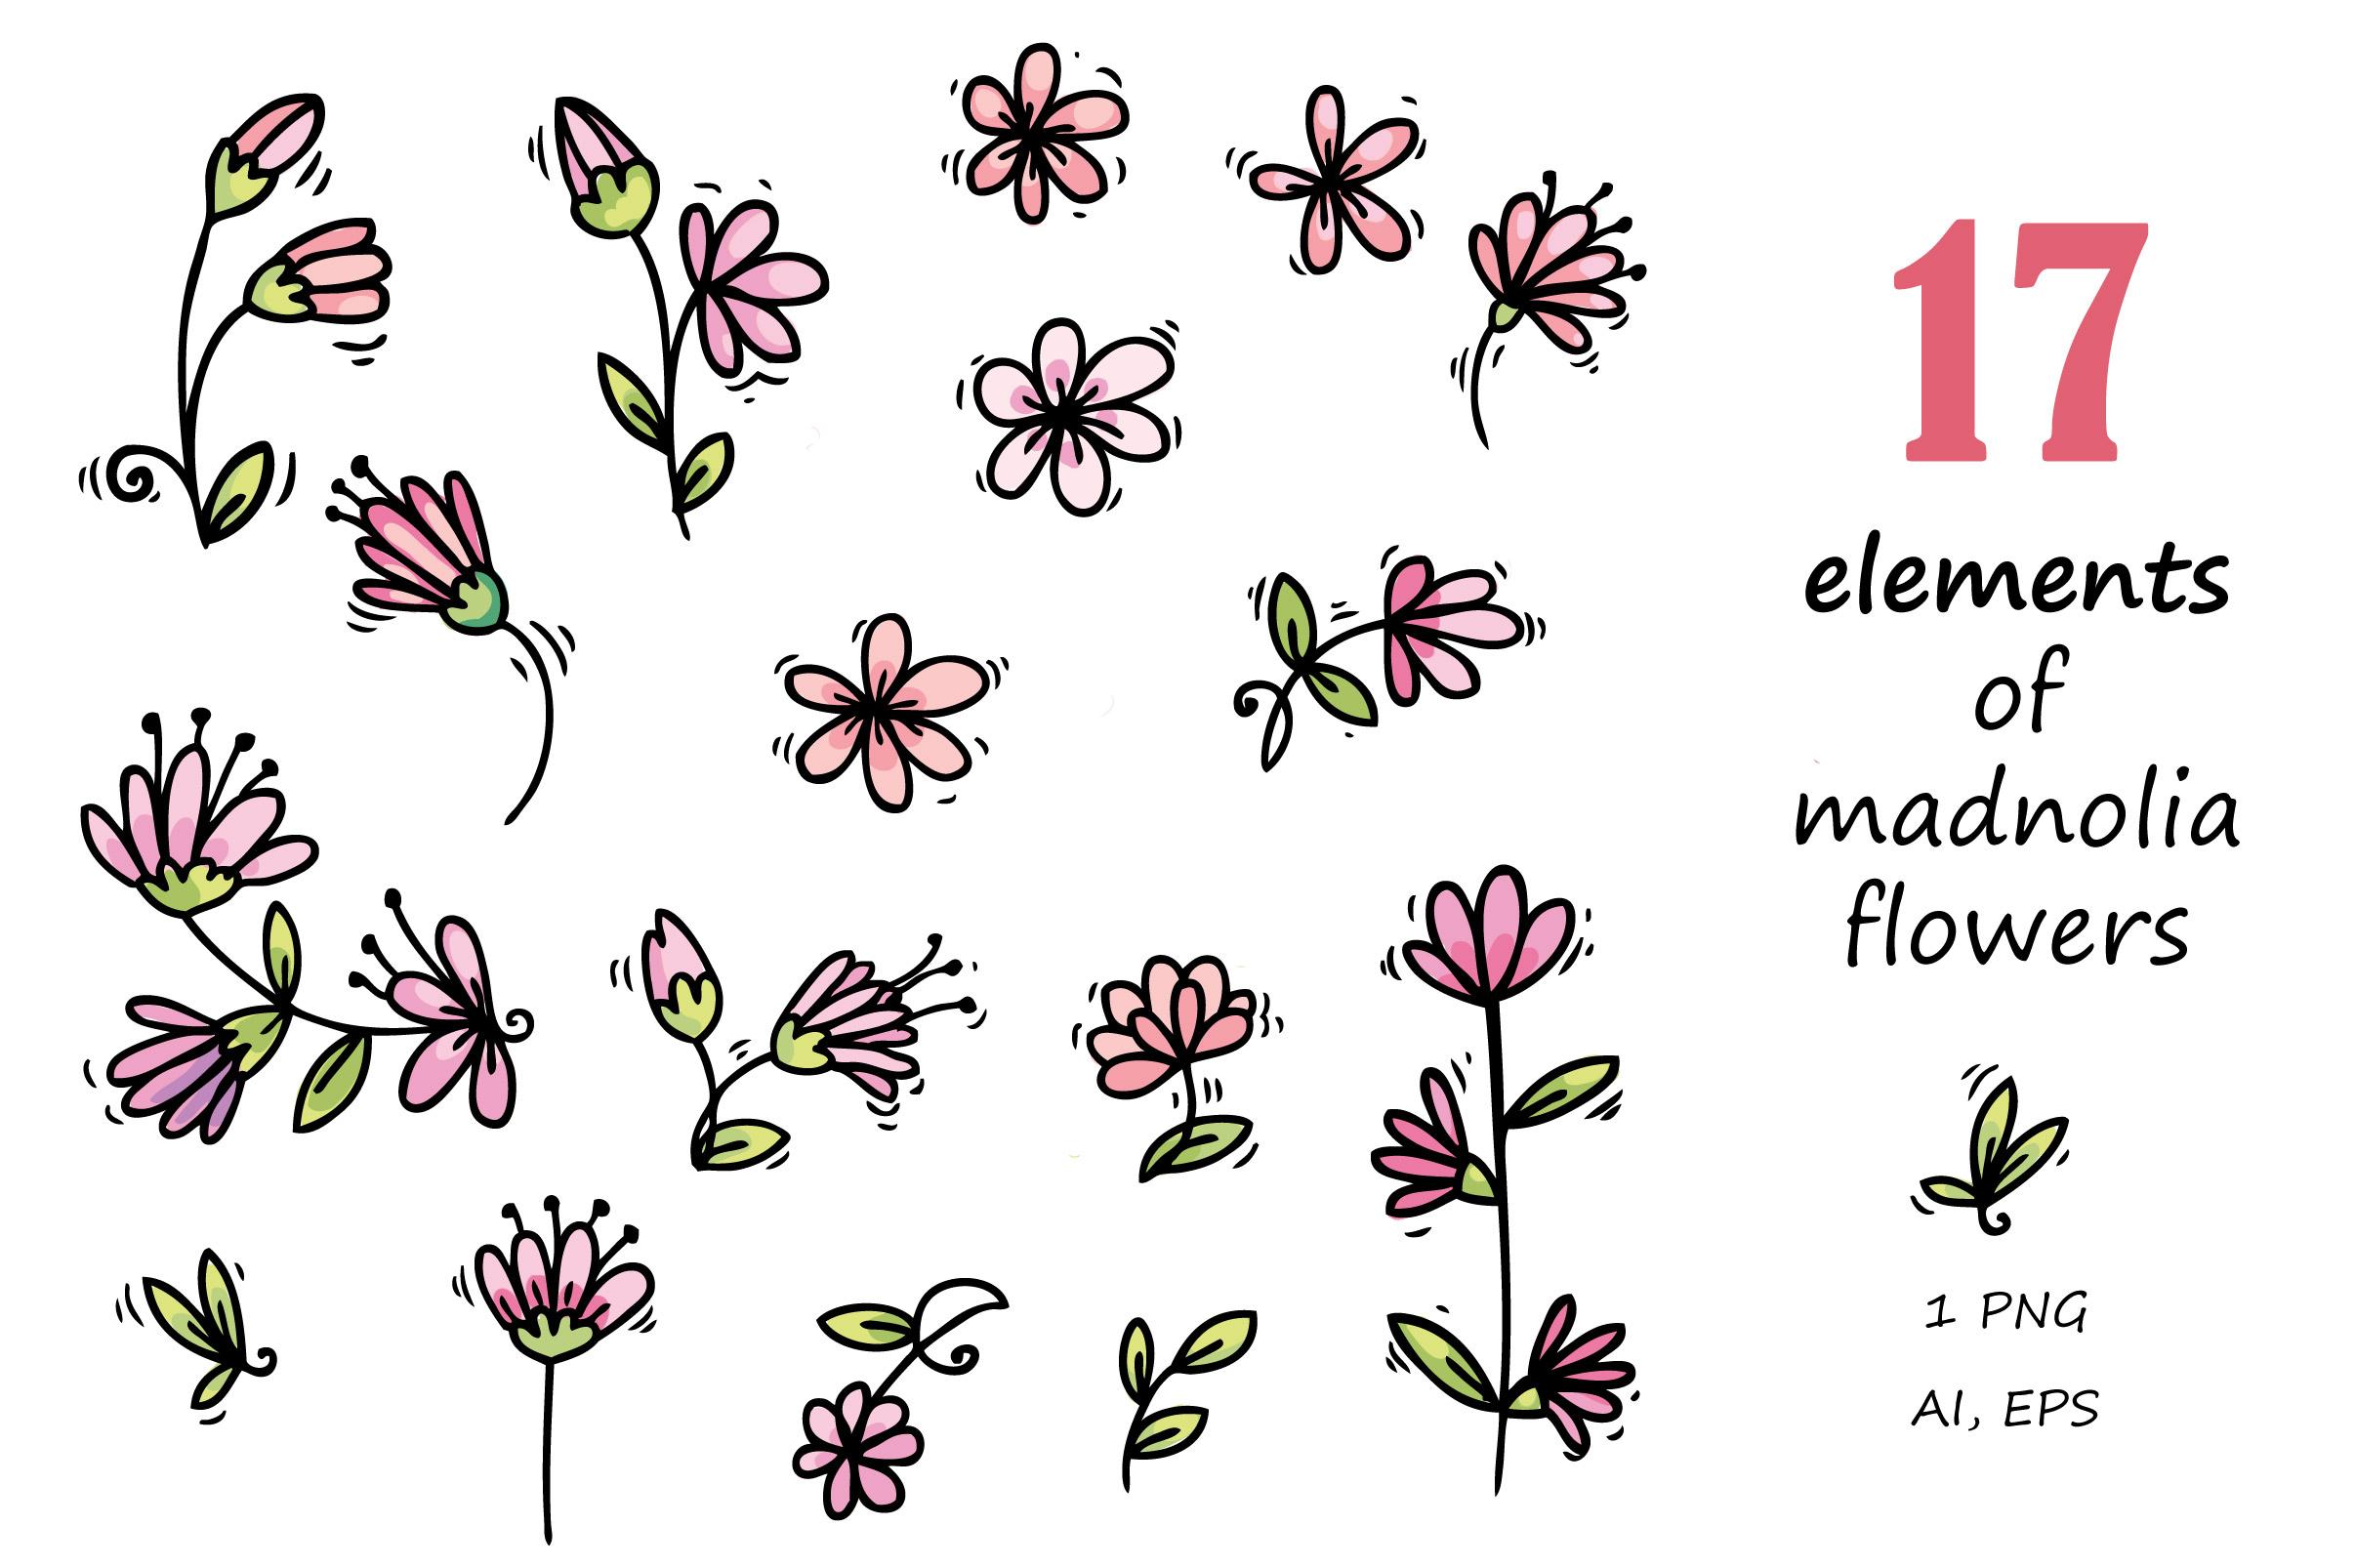 Pugs&Magnolias 29 elements example image 3